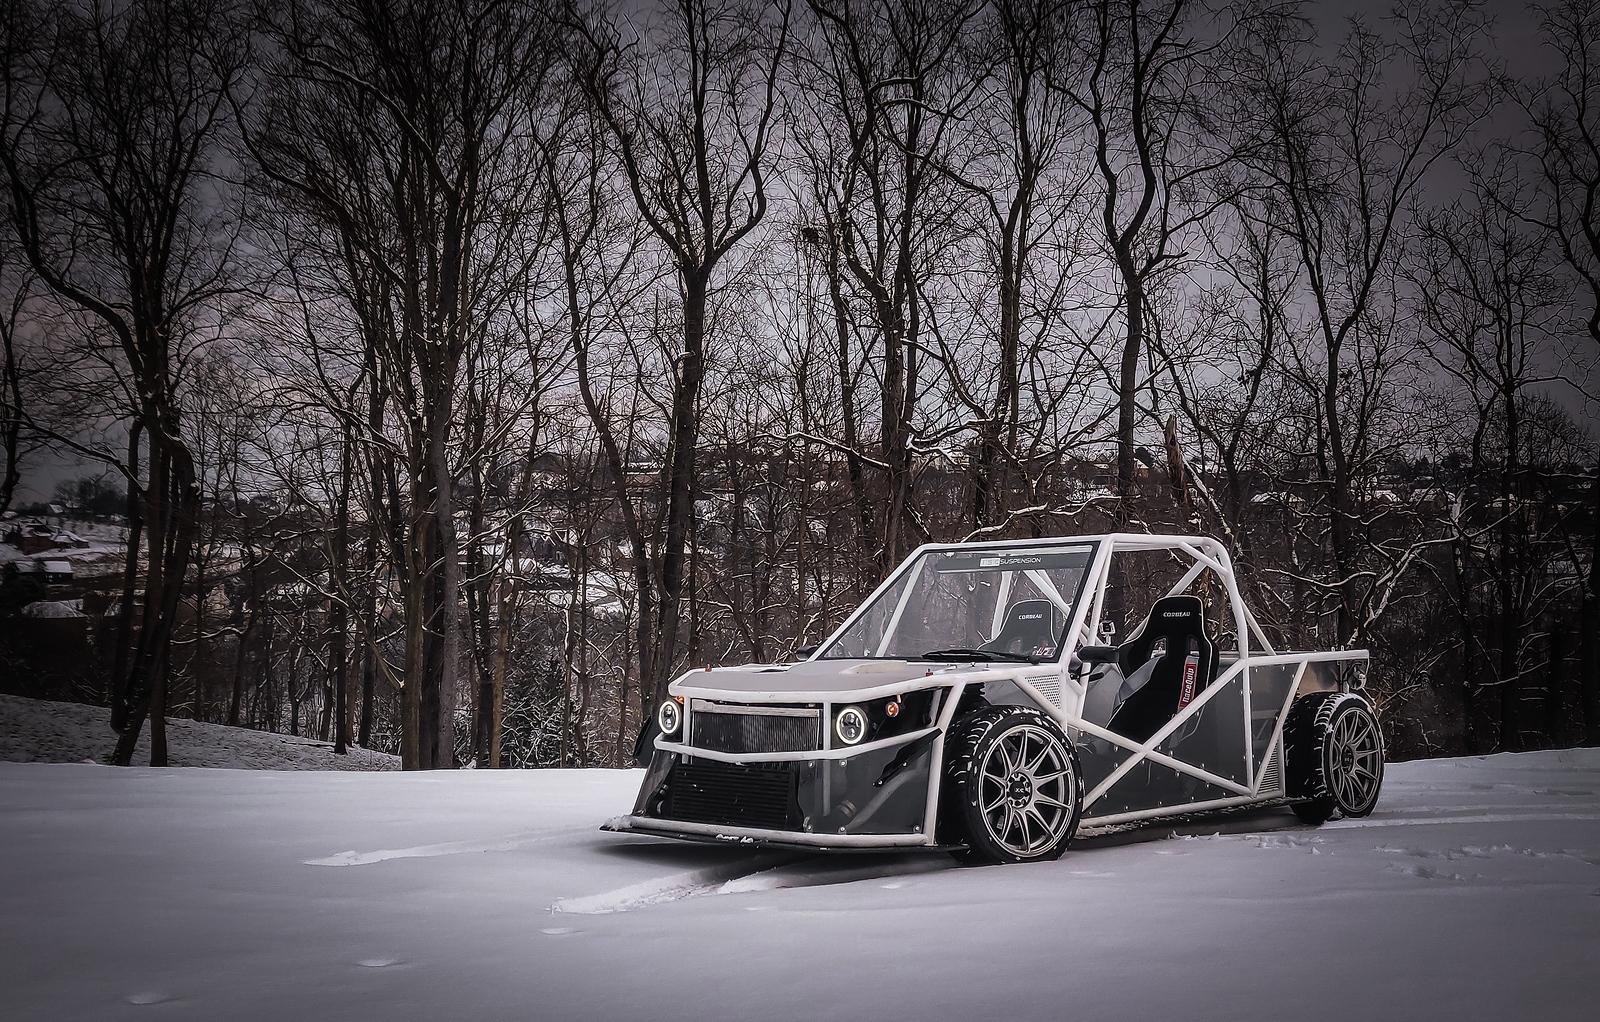 Terry's Tube-a-Ruu 400hp Exotruck - Subaru Impreza GC8 & RS